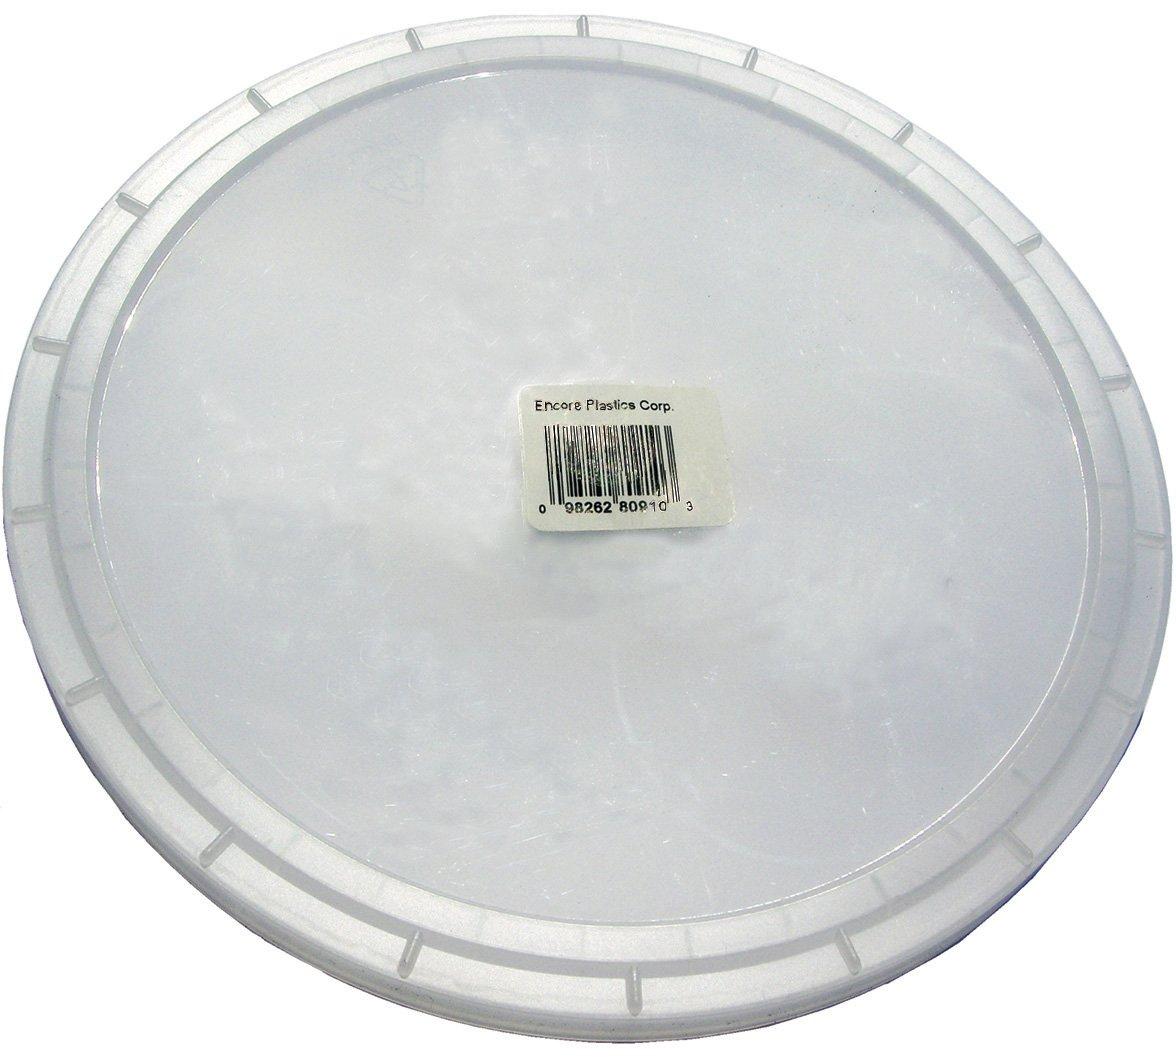 Encore Plastics 80900 Mix'N Measure Lid, 5-Quart Encore Plastics 80900 Mix' N Measure Lid ZipWall